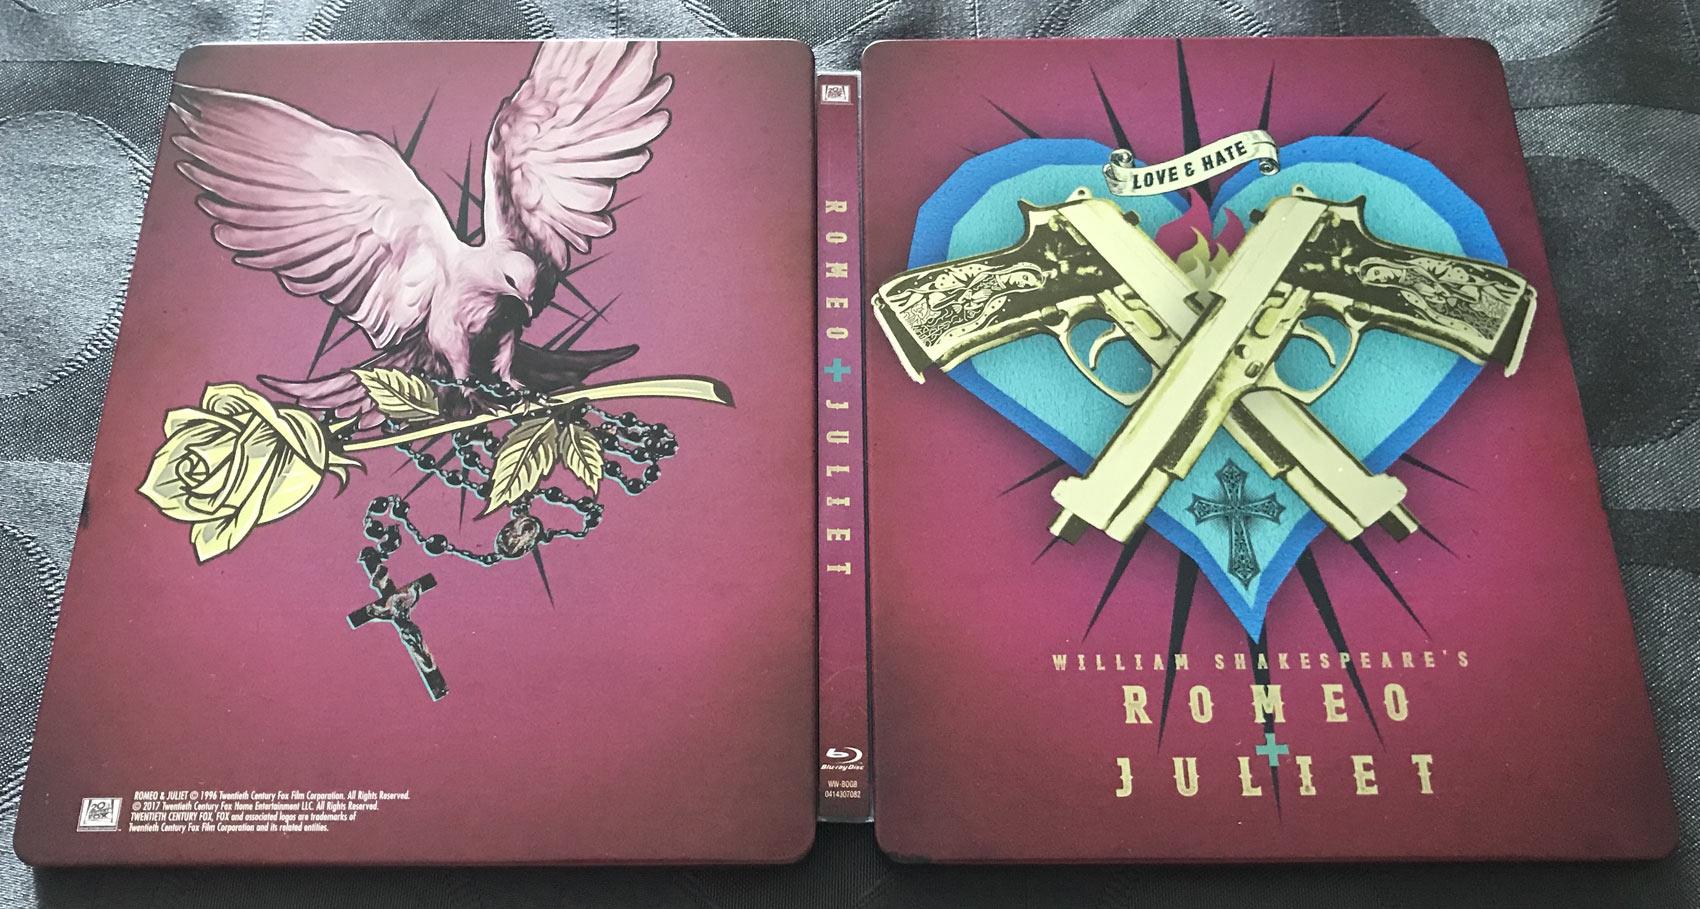 Romeo-+-Juliet-steelbook-zavvi2